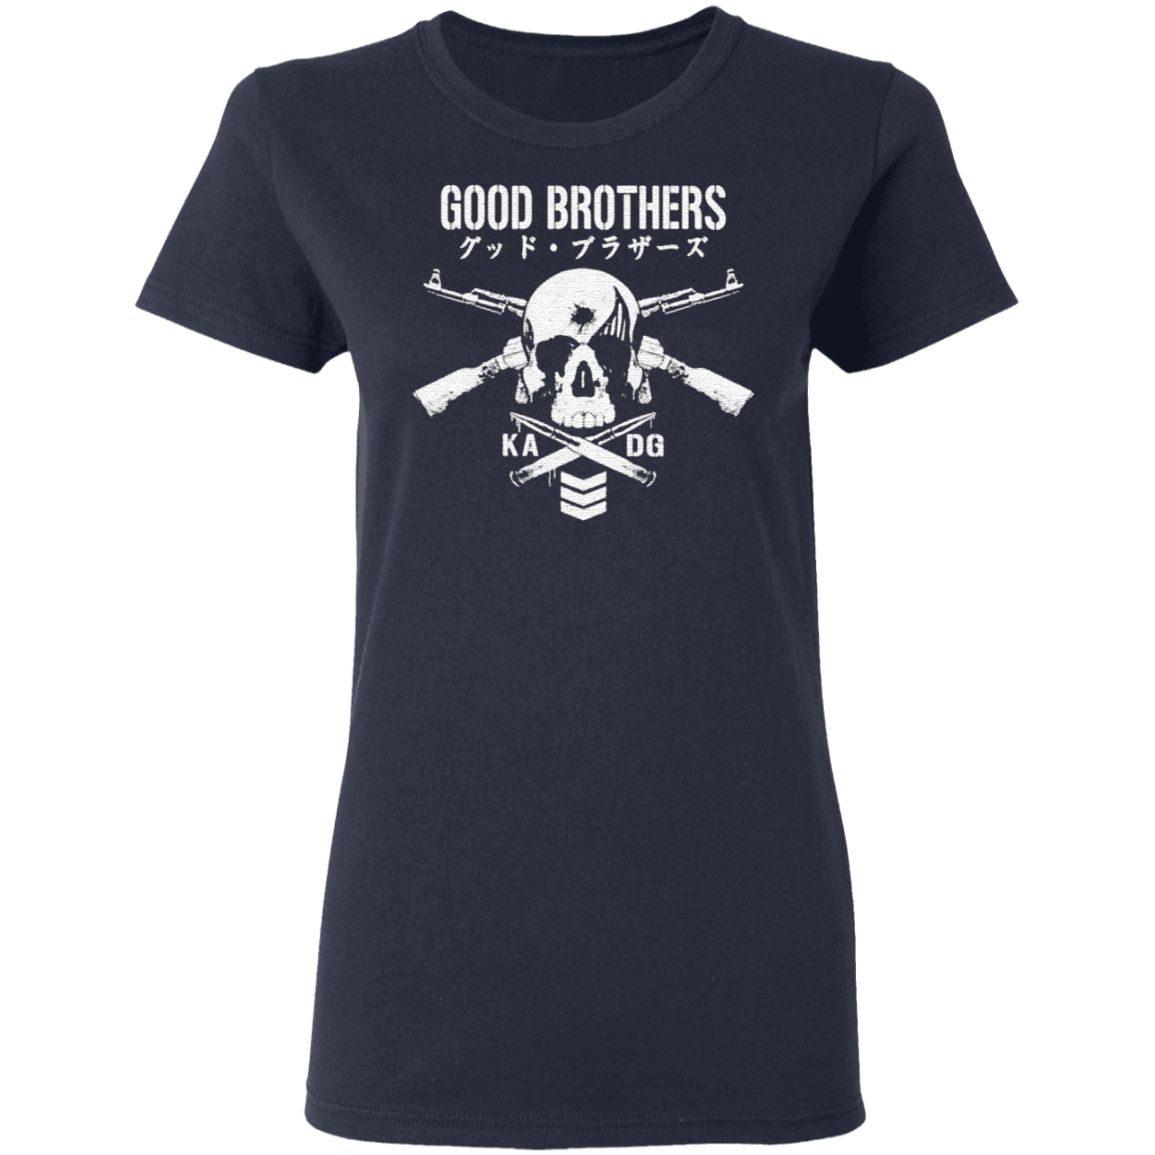 Karl Anderson & Doc Gallows Good Brothers Tee Shirt